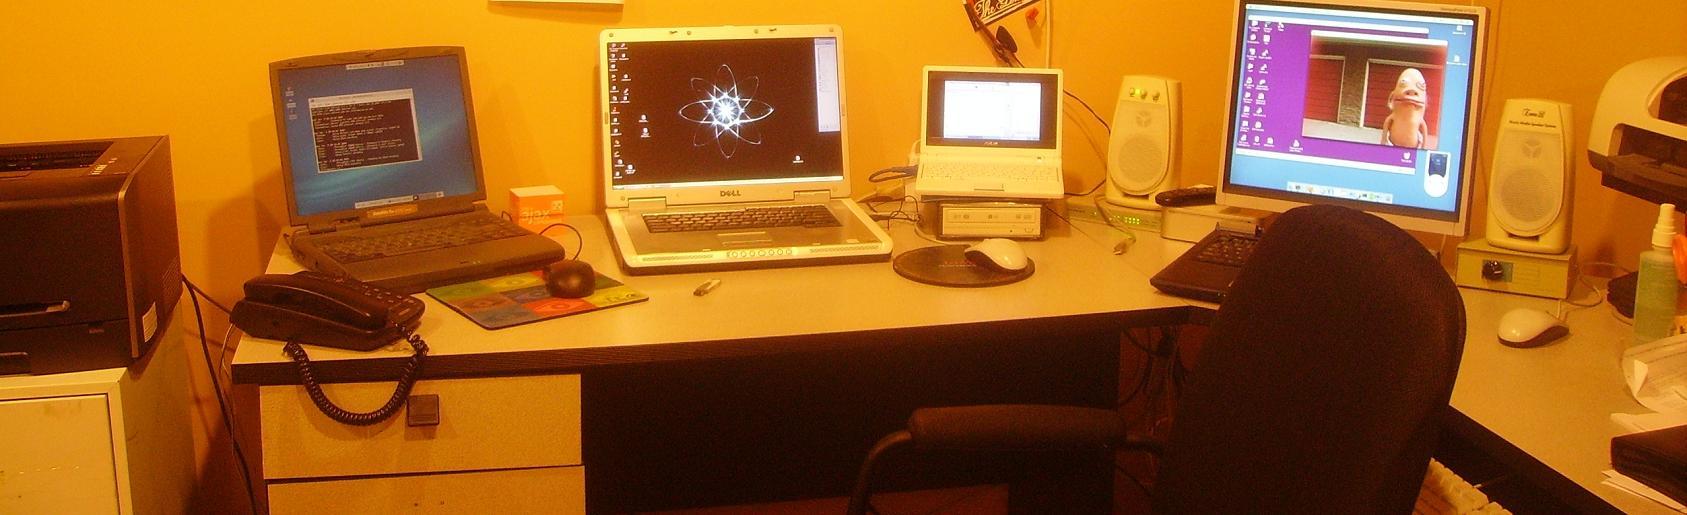 my home office computer setup